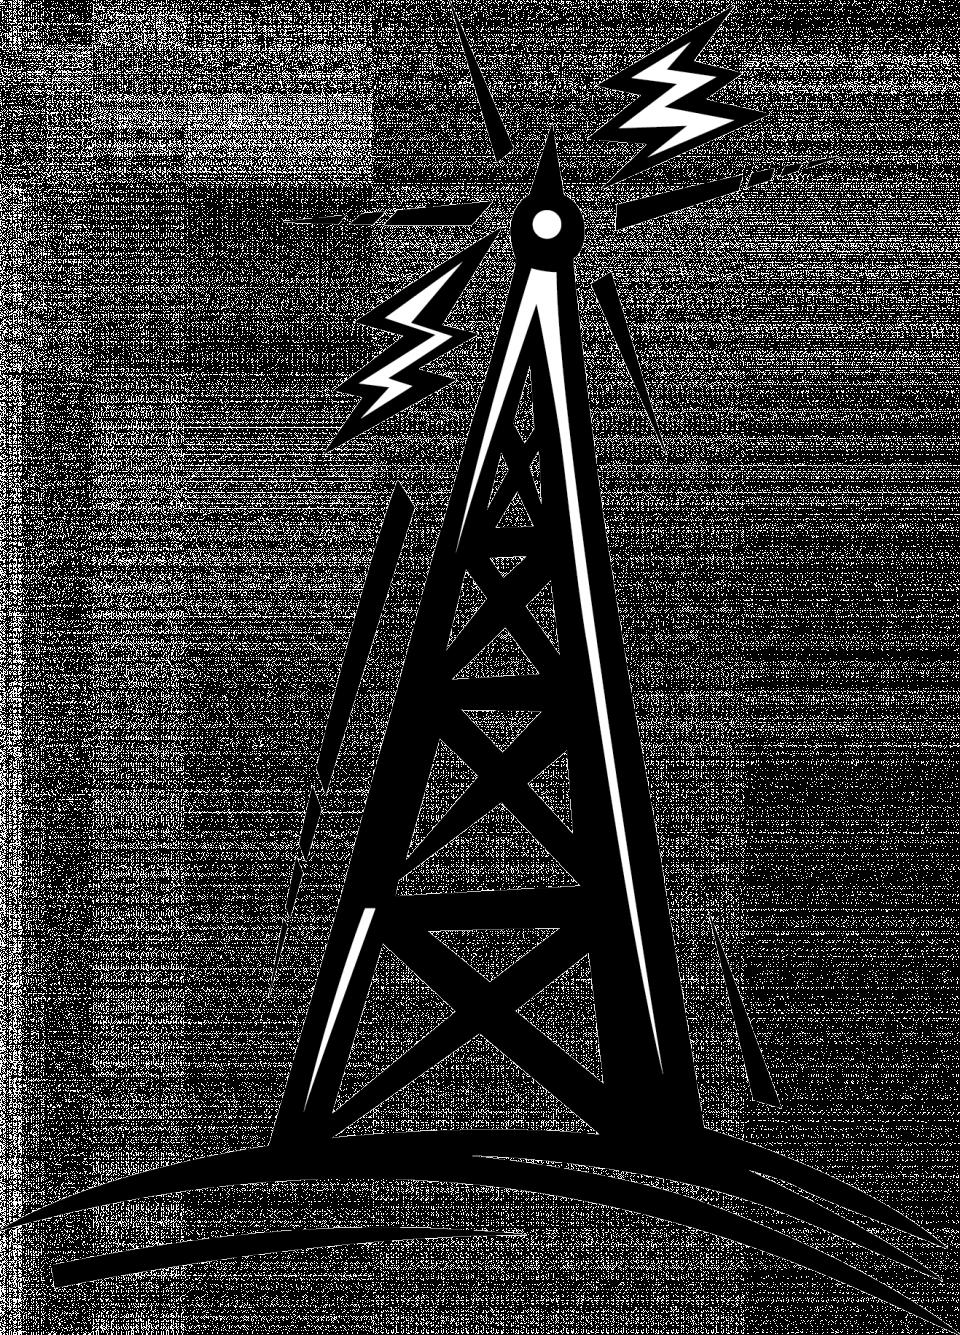 Clipart music stereo. Ham radio group tower